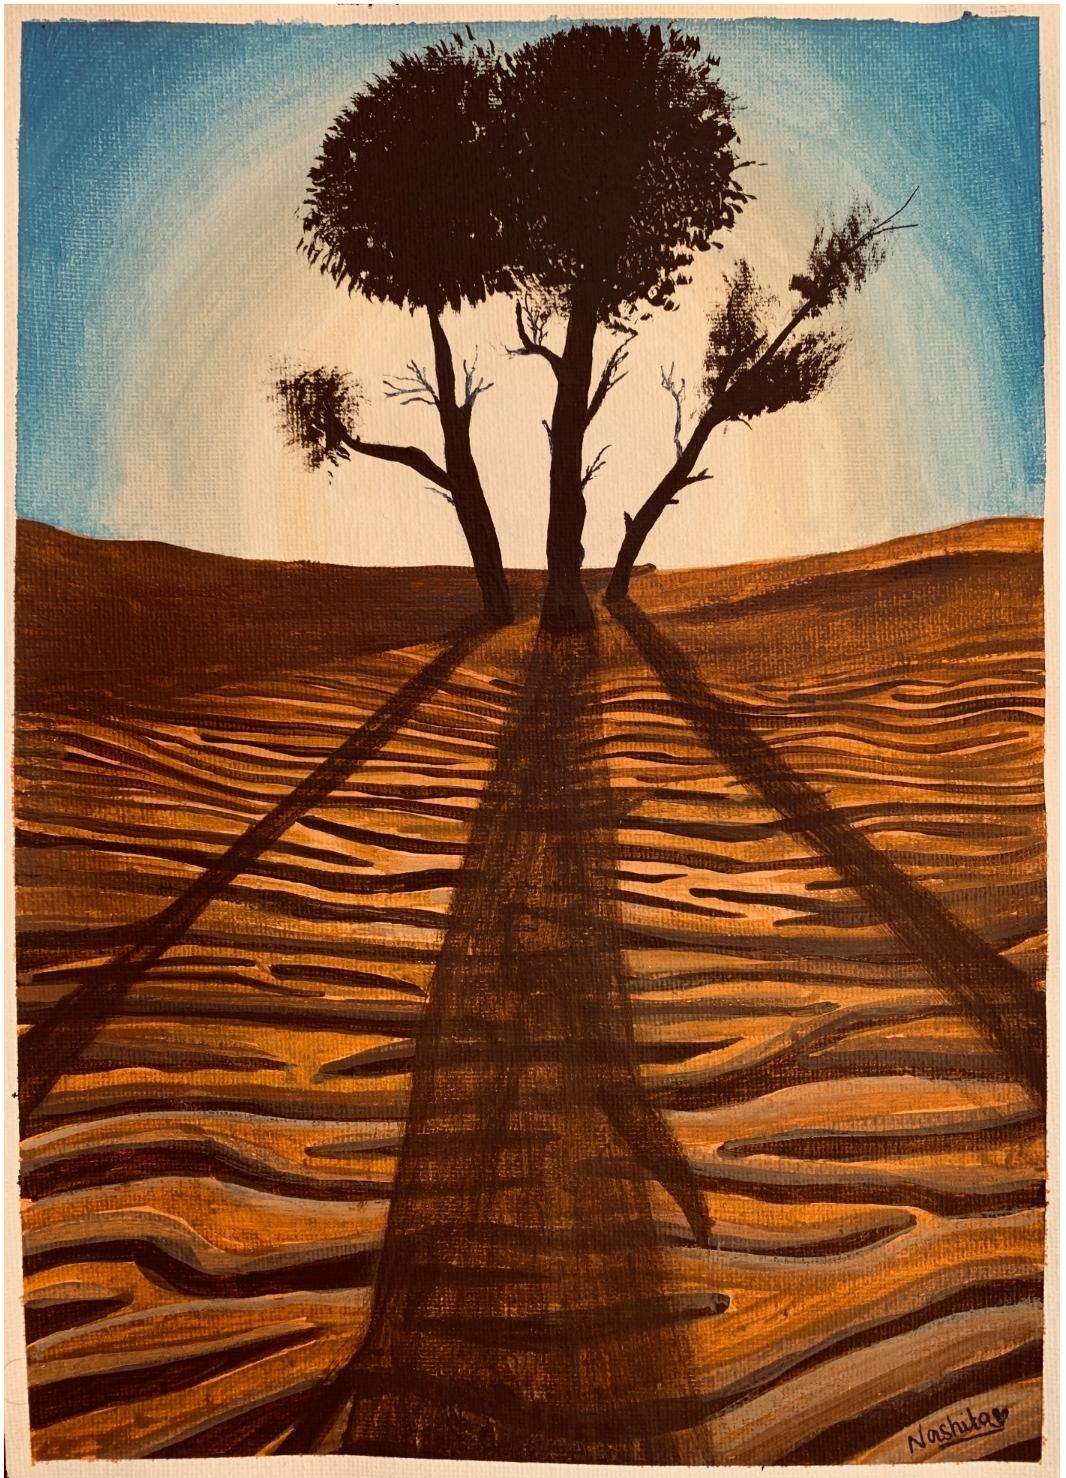 The Majestic Desert by Nashita Tarub